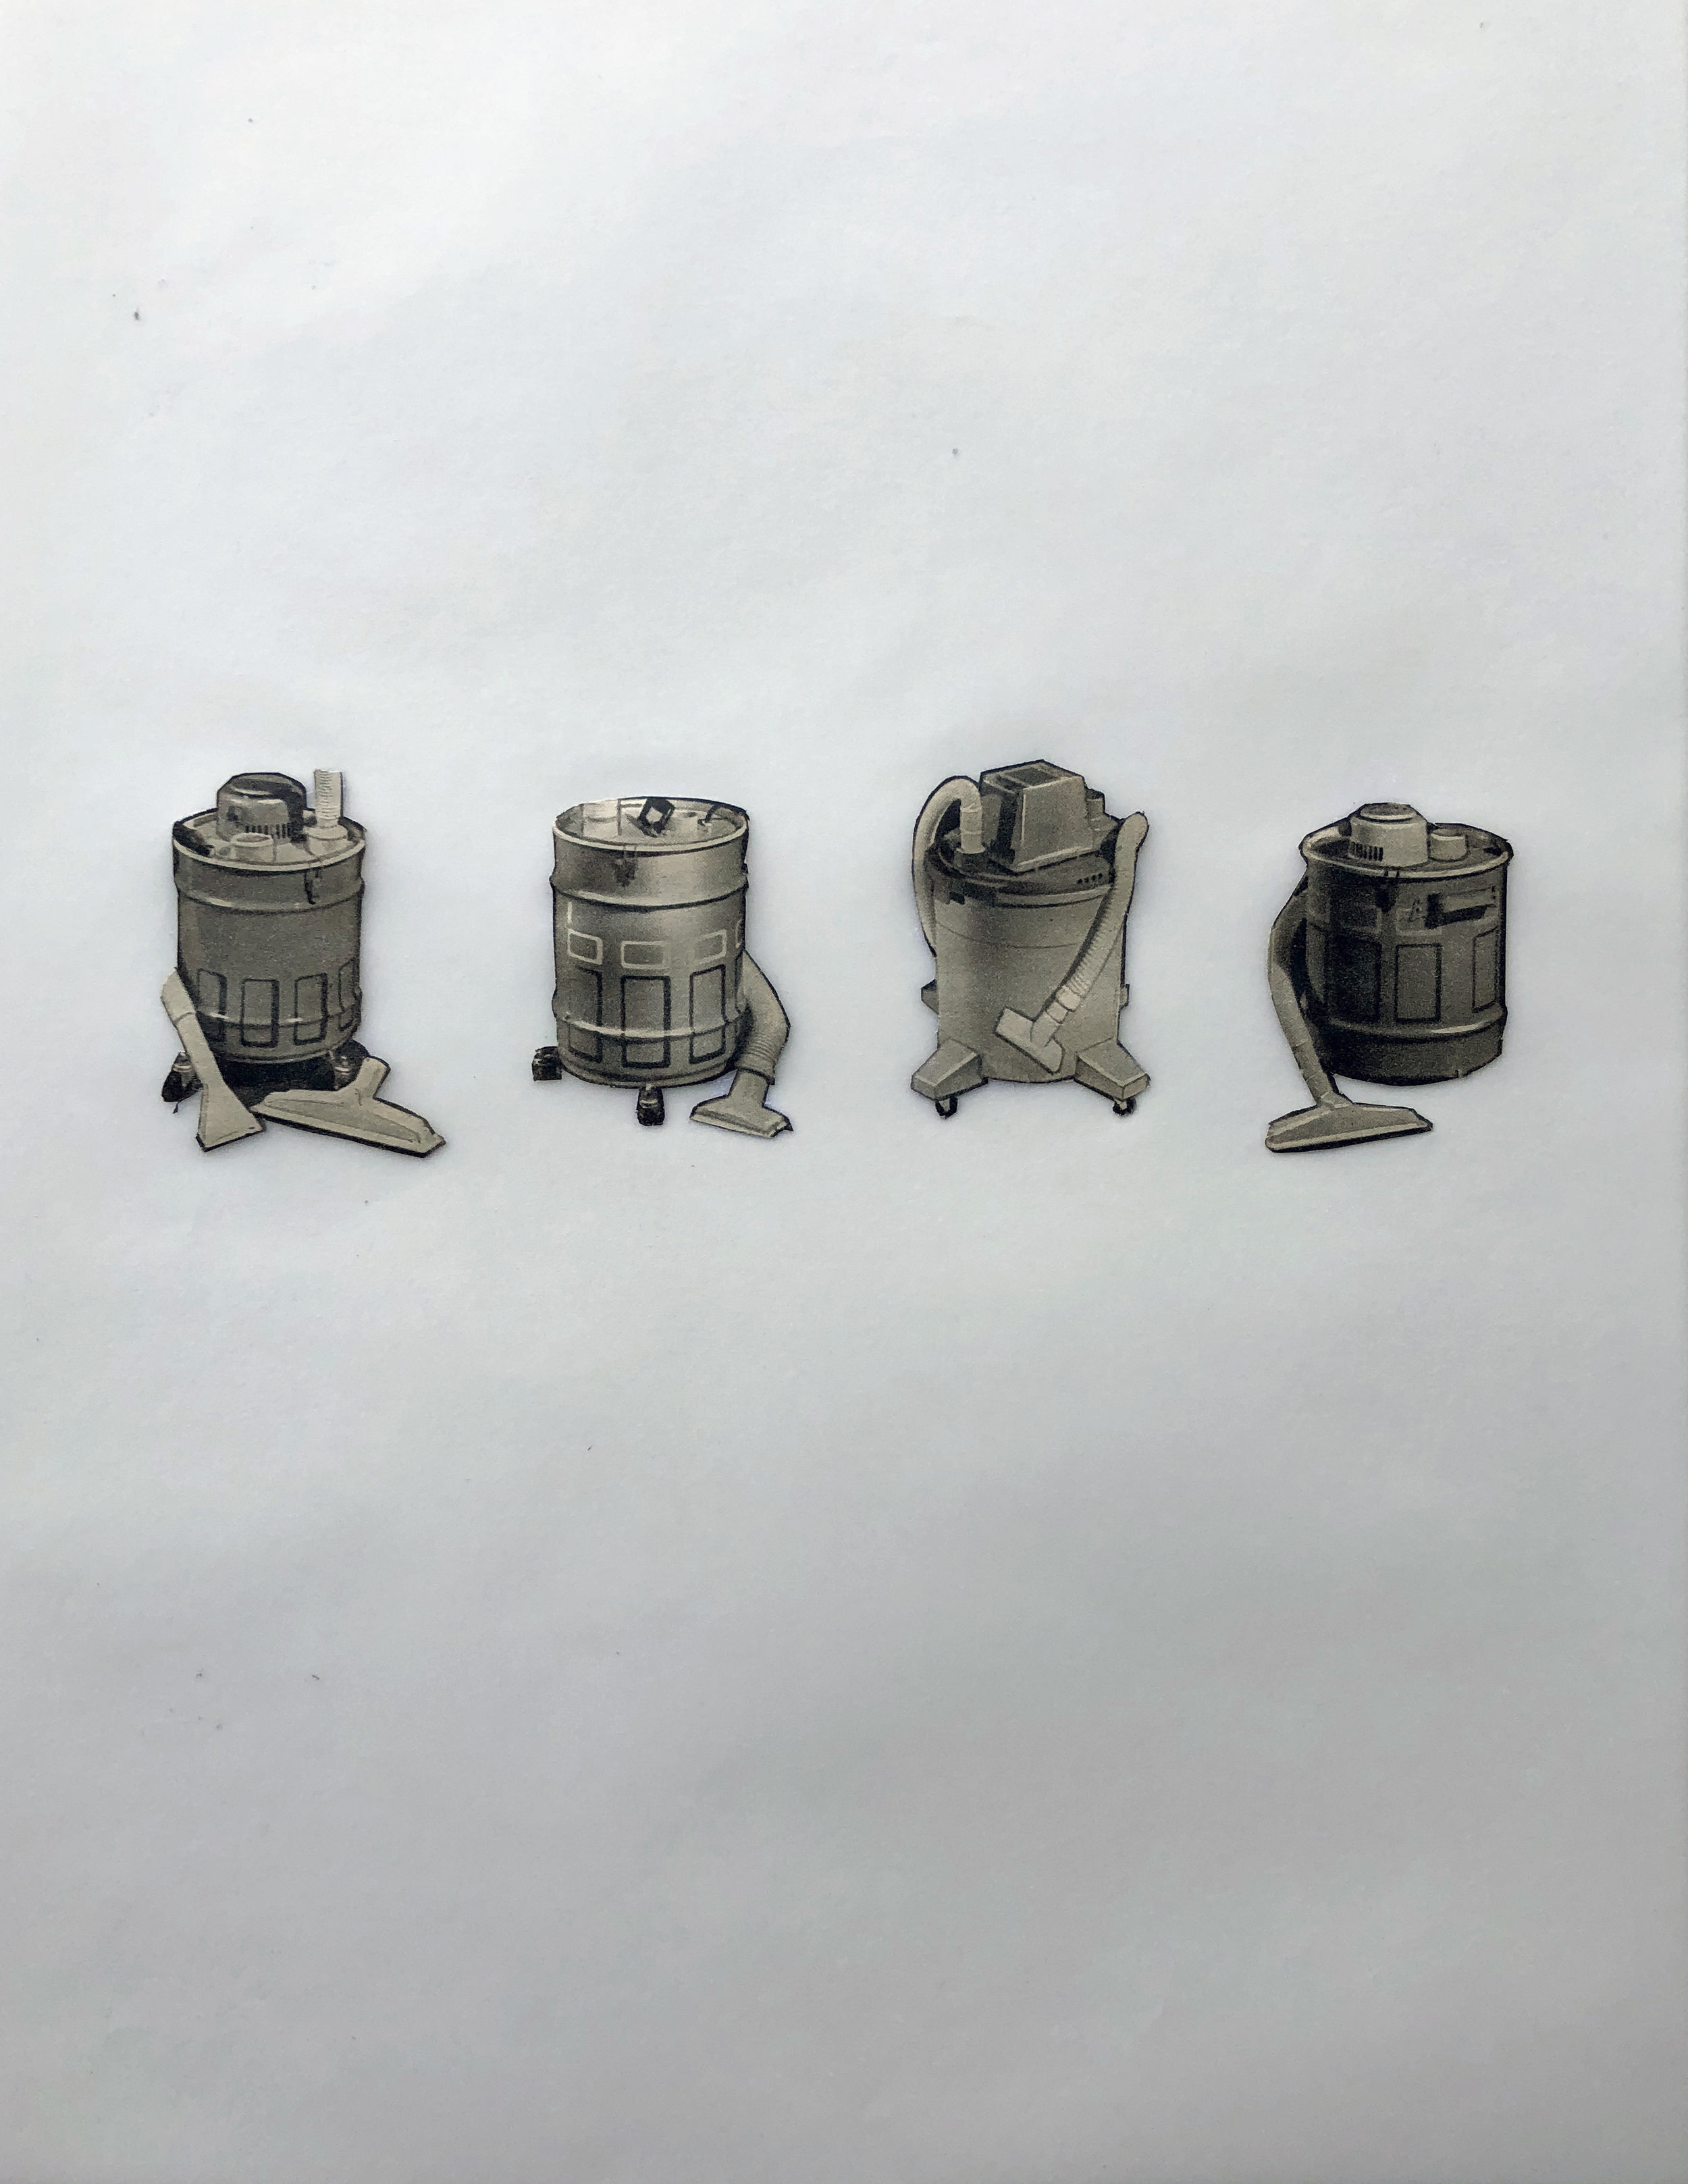 CAT - RIFF - Becher - vacuum droids - CROP.jpg